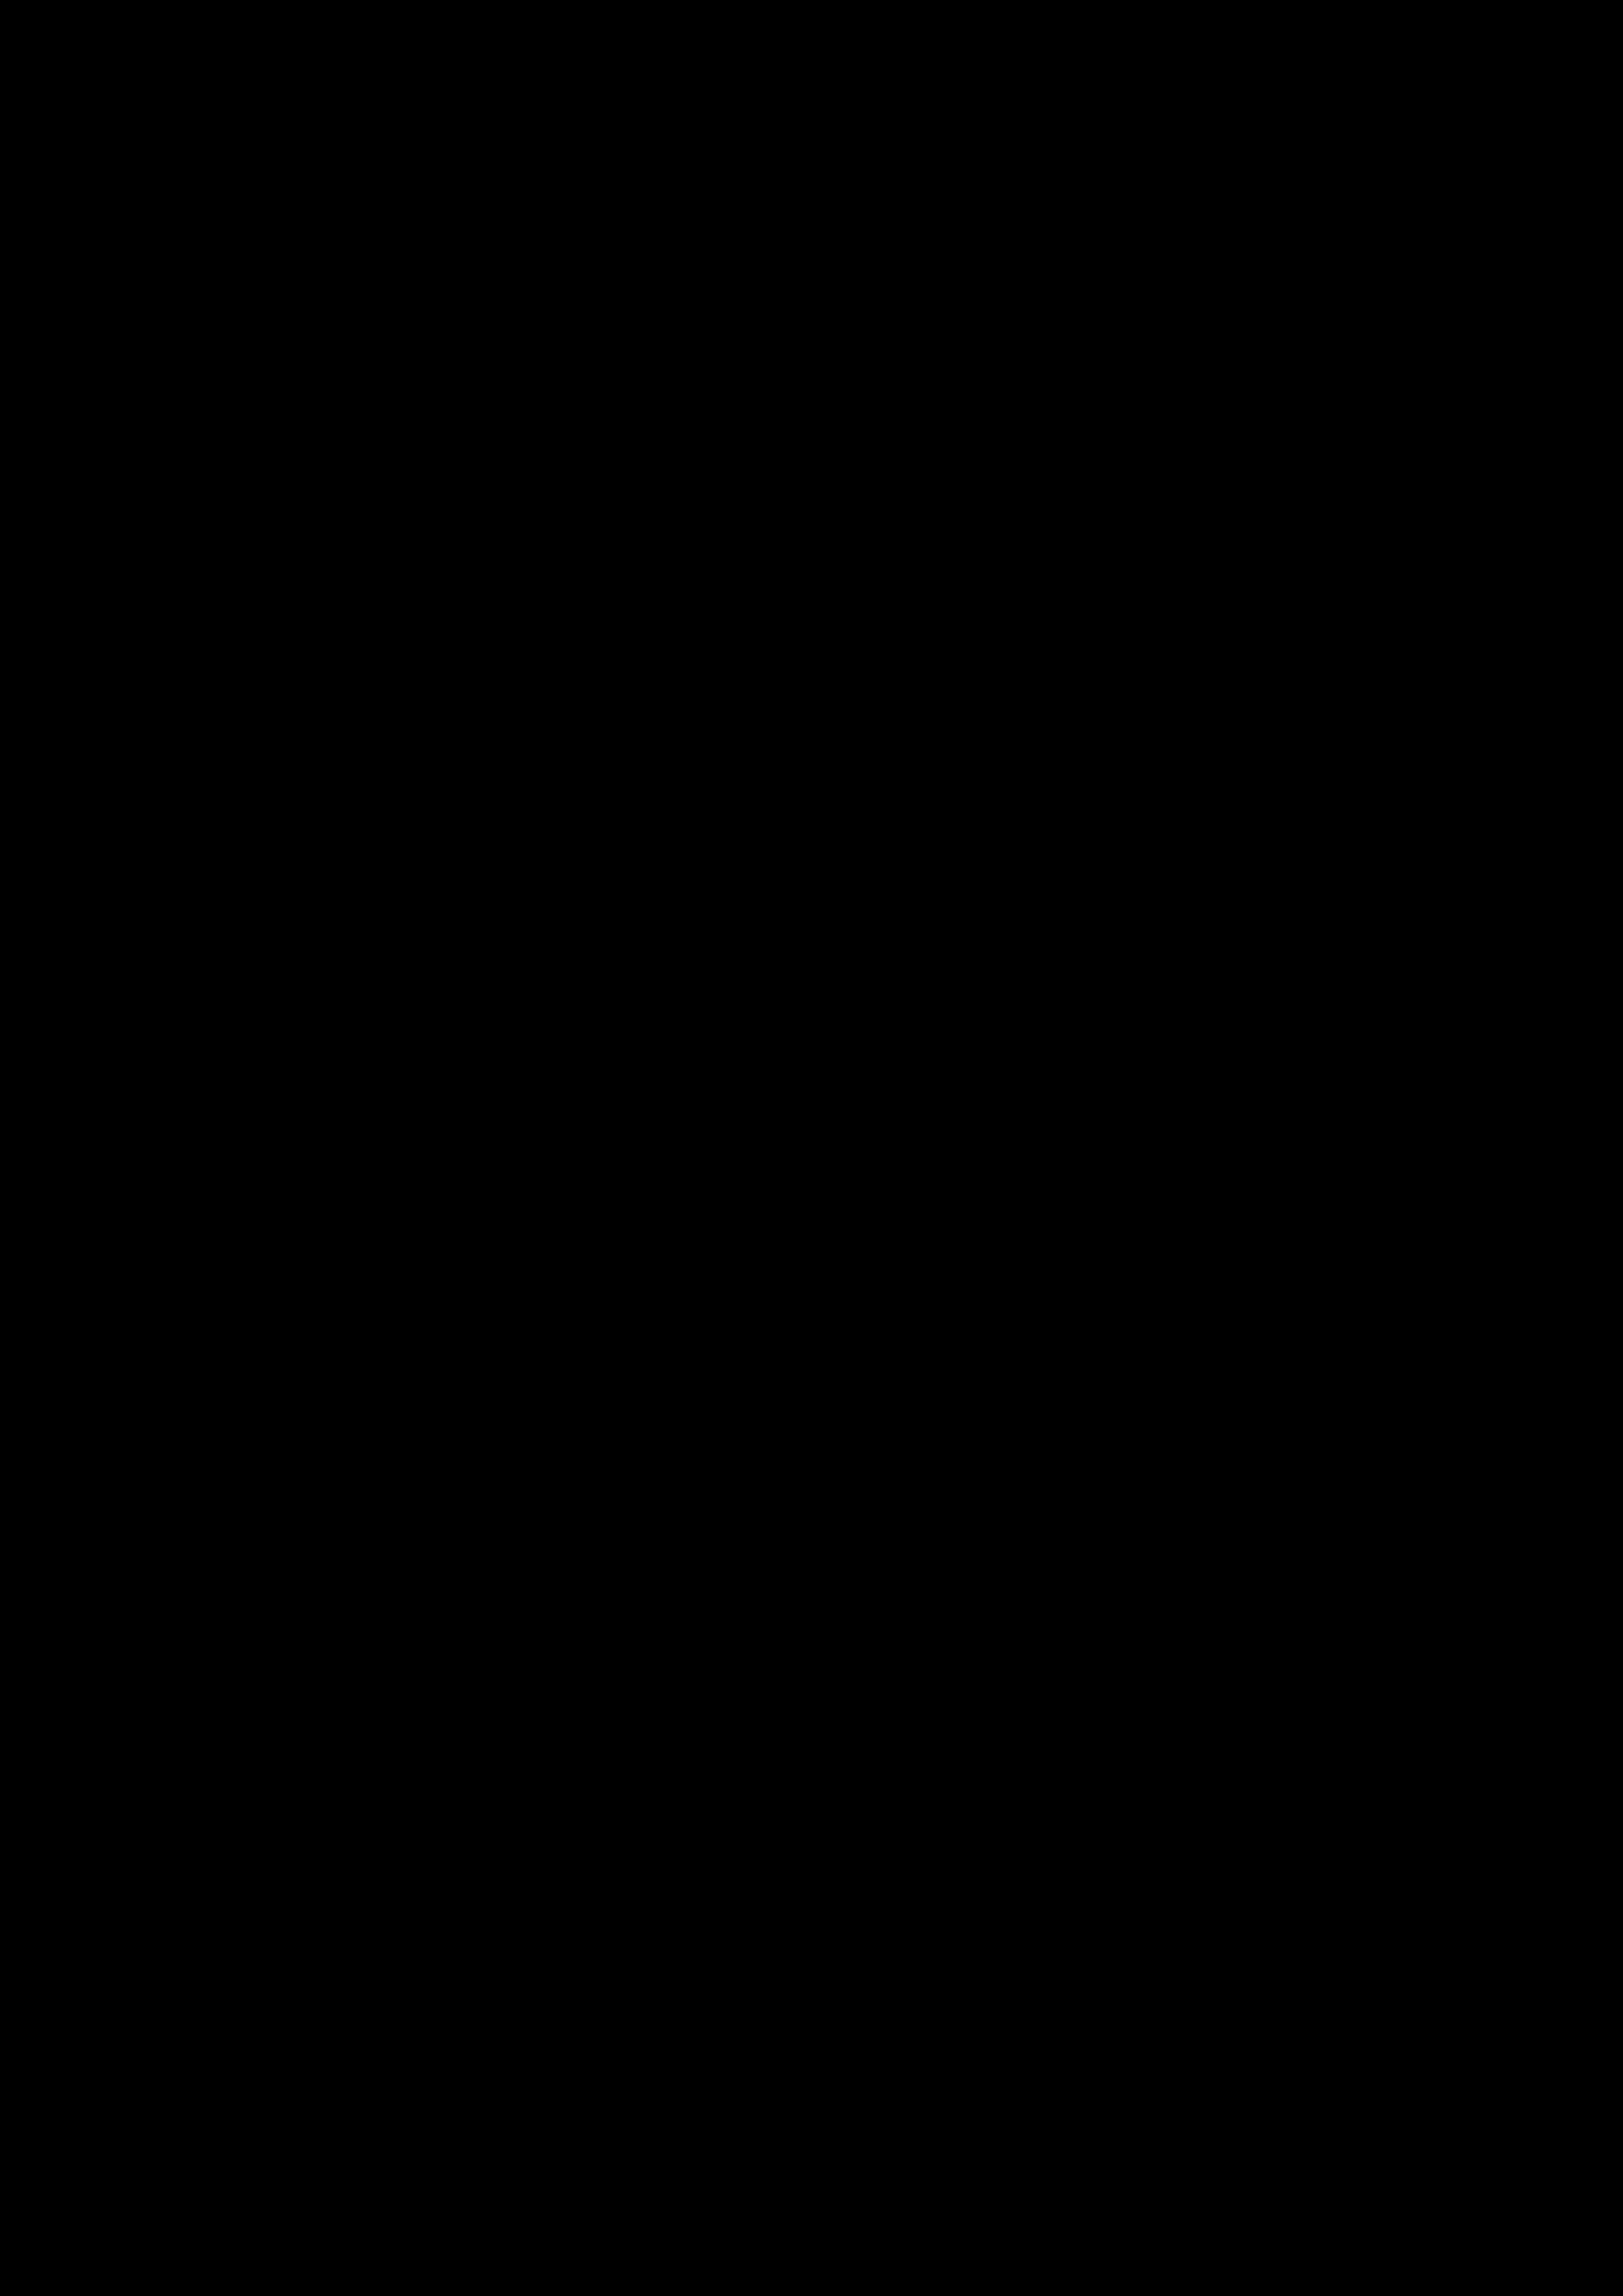 Ibex clipart Clipart shape Ibex Ibex shape